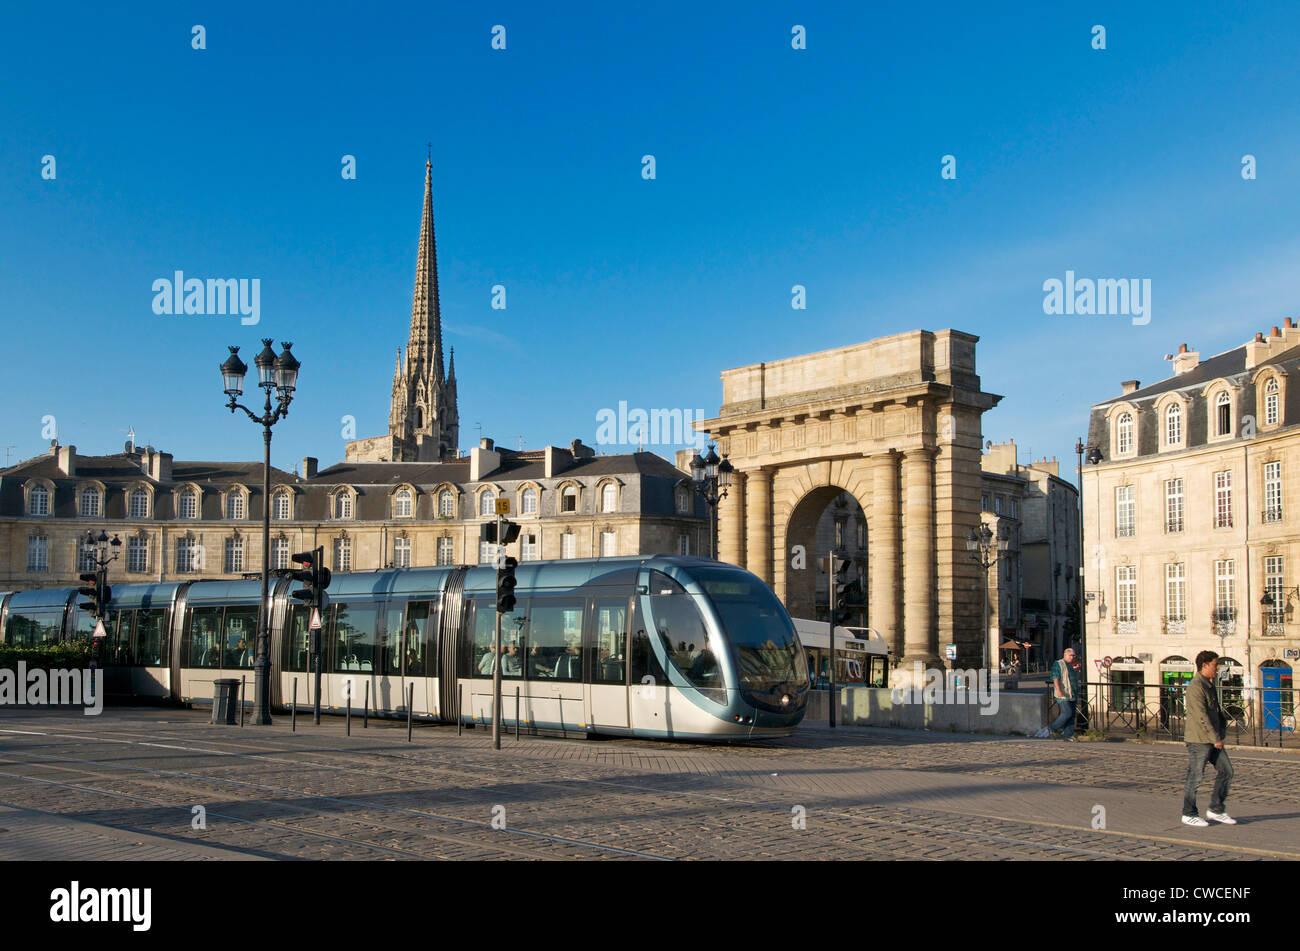 Public transport tram system in Bordeaux city centre, France, Europe - Stock Image